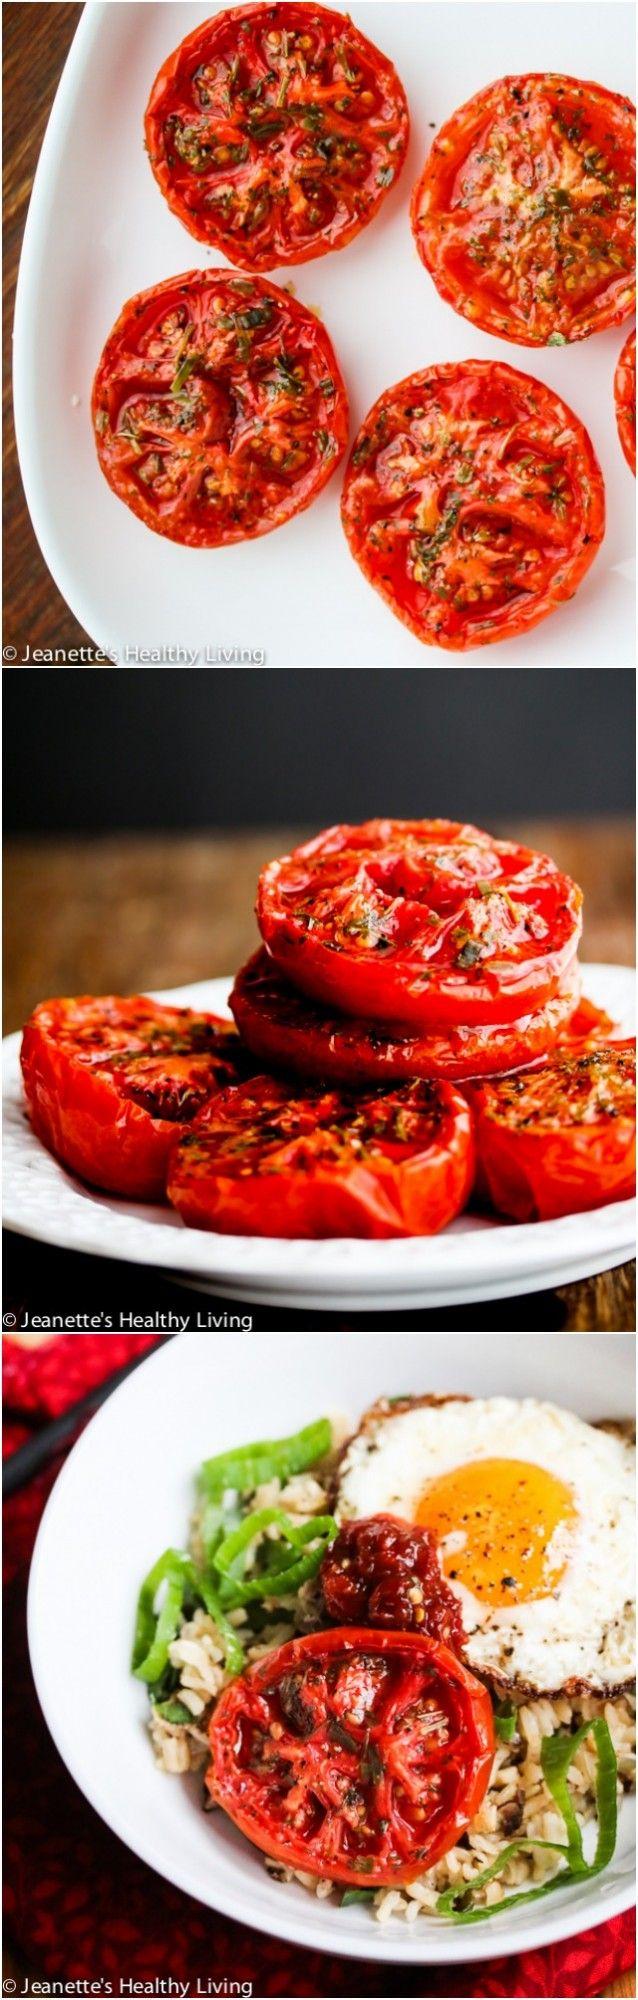 Slow Roasted Summer Tomatoes © Jeanette's Healthy Living #tomatoes #vegetarian #vegan #reciperedux